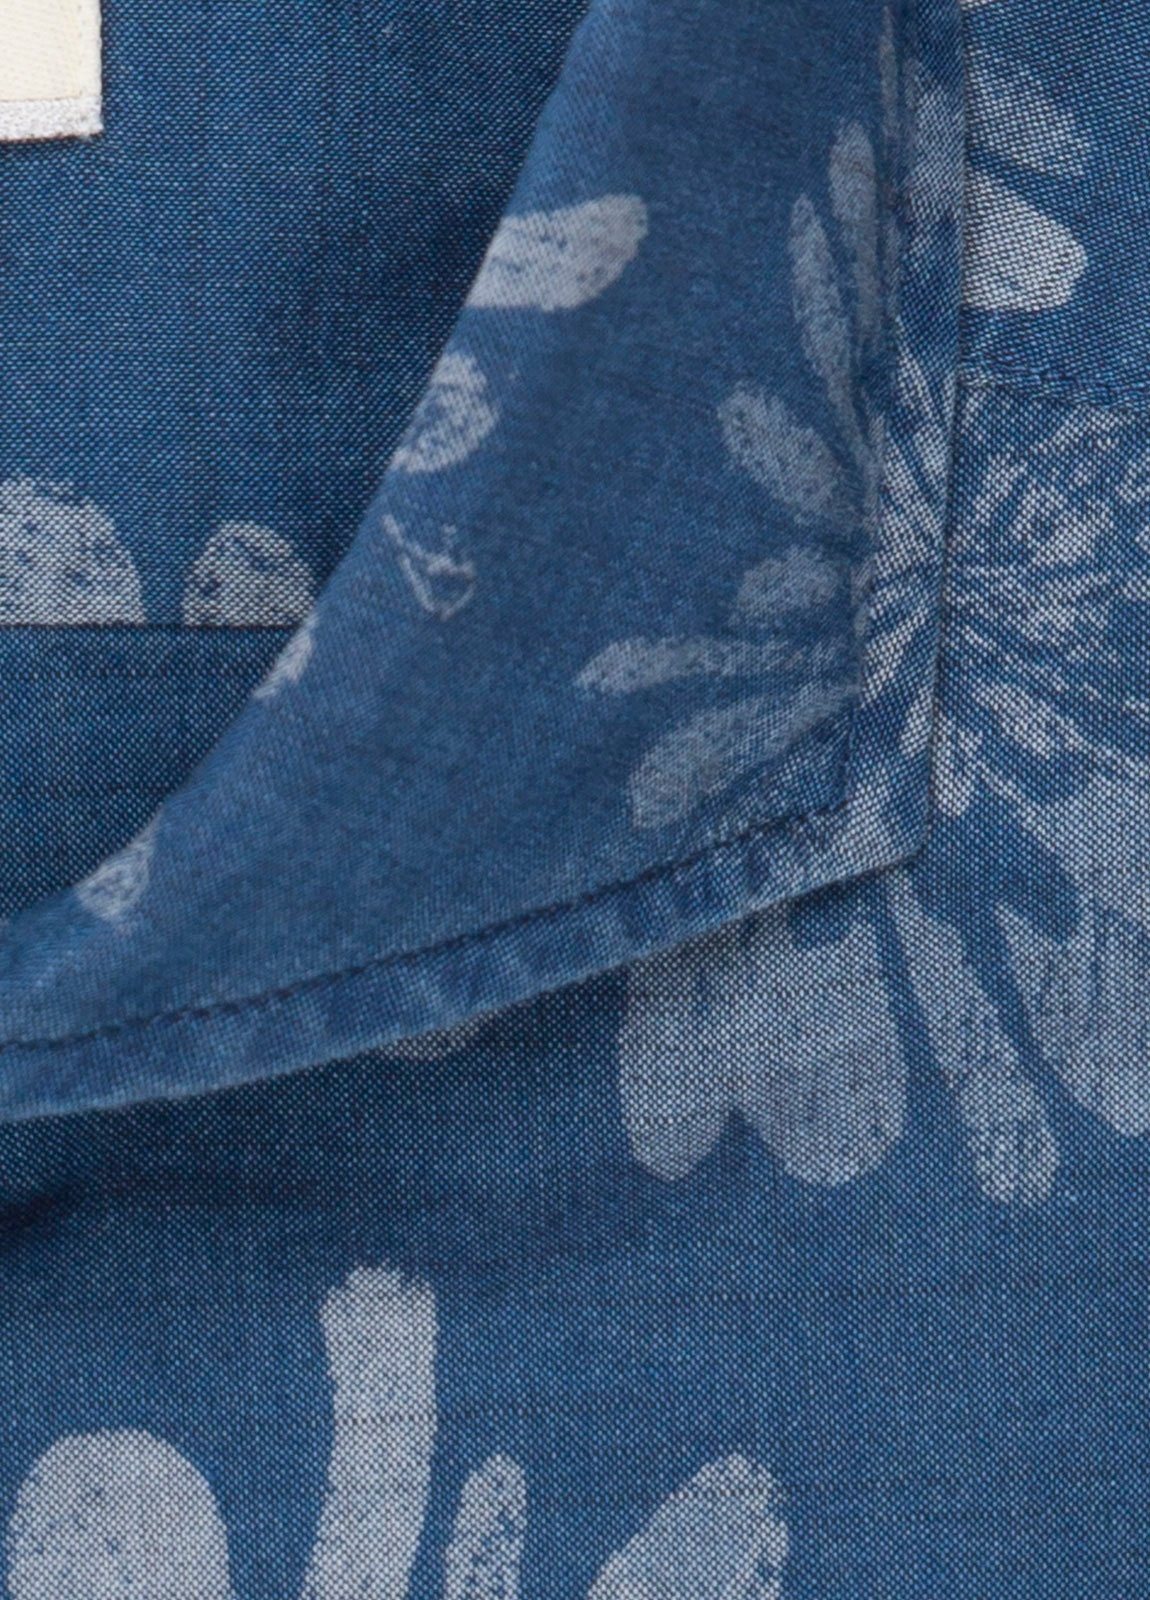 Camisa sport FUREST COLECCIÓN SLIM FIT dibujo azul denim - Ítem2